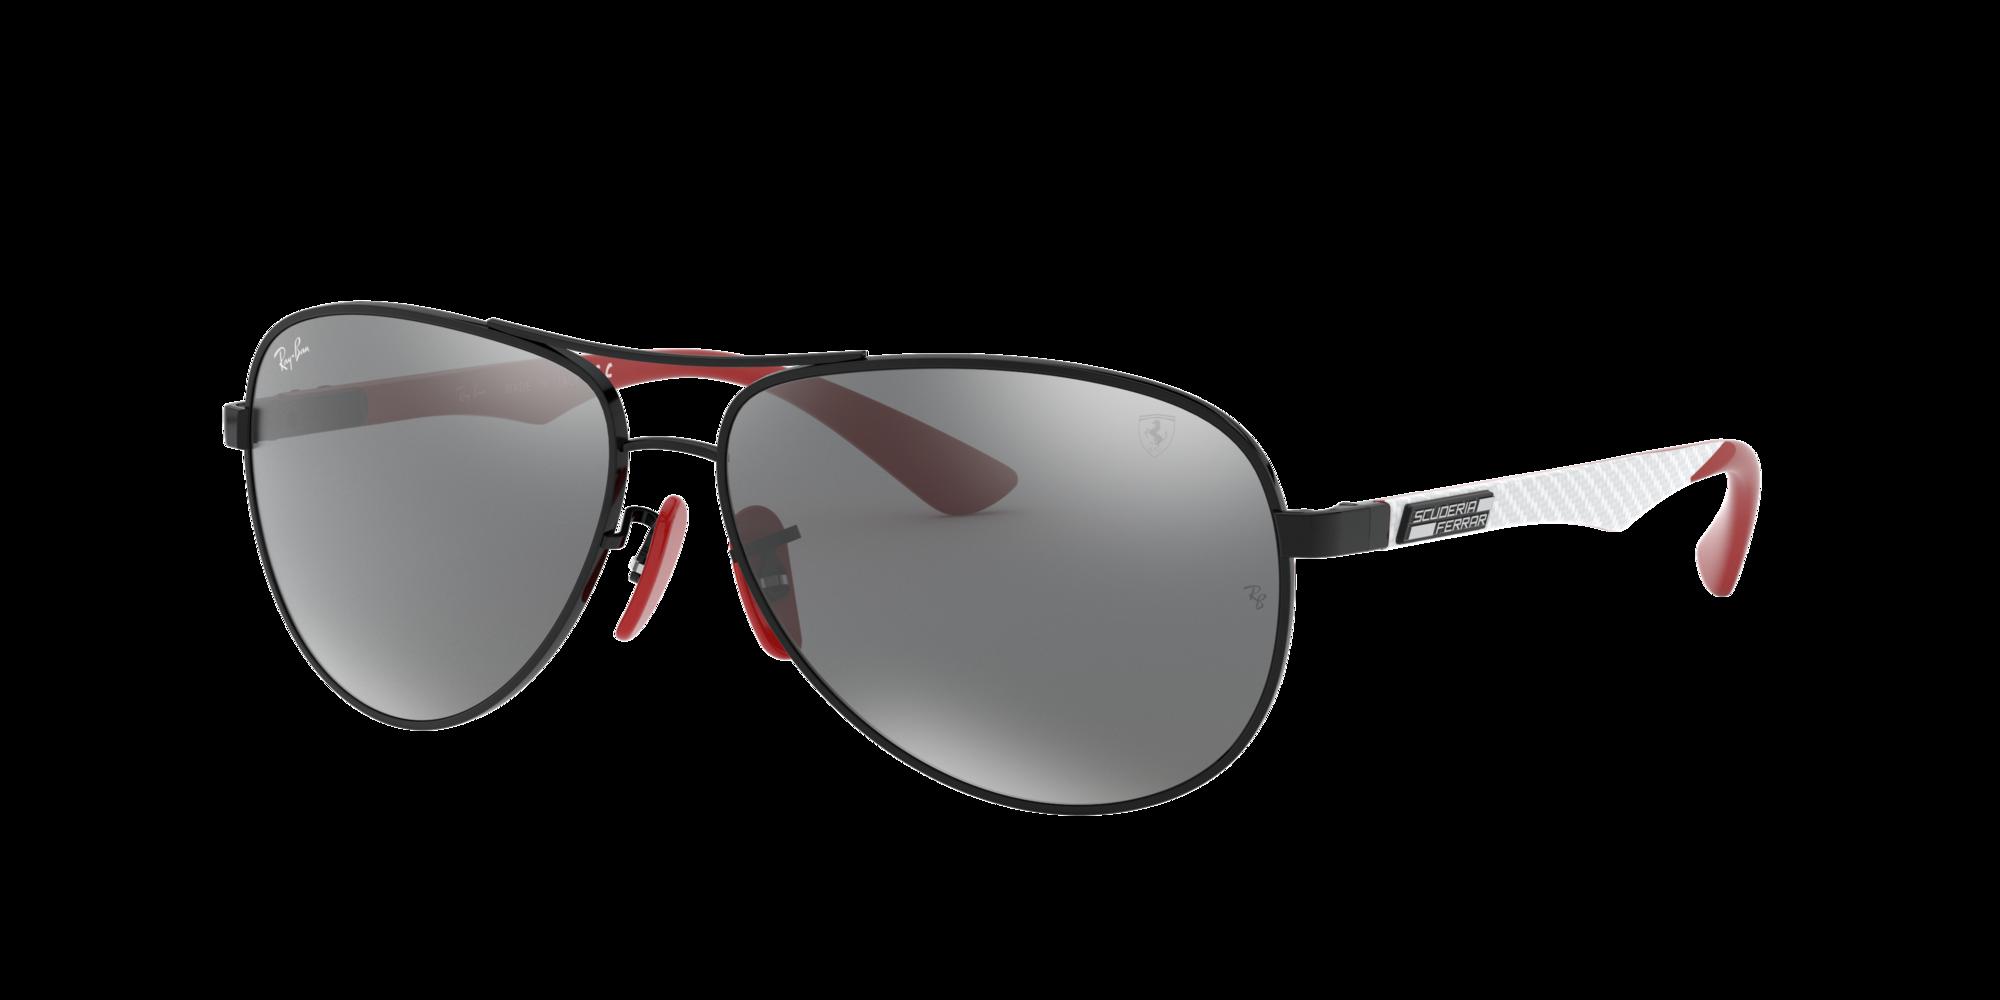 Ray Ban Rb8313m 61 Ferrari Sunglasses Lenscrafters